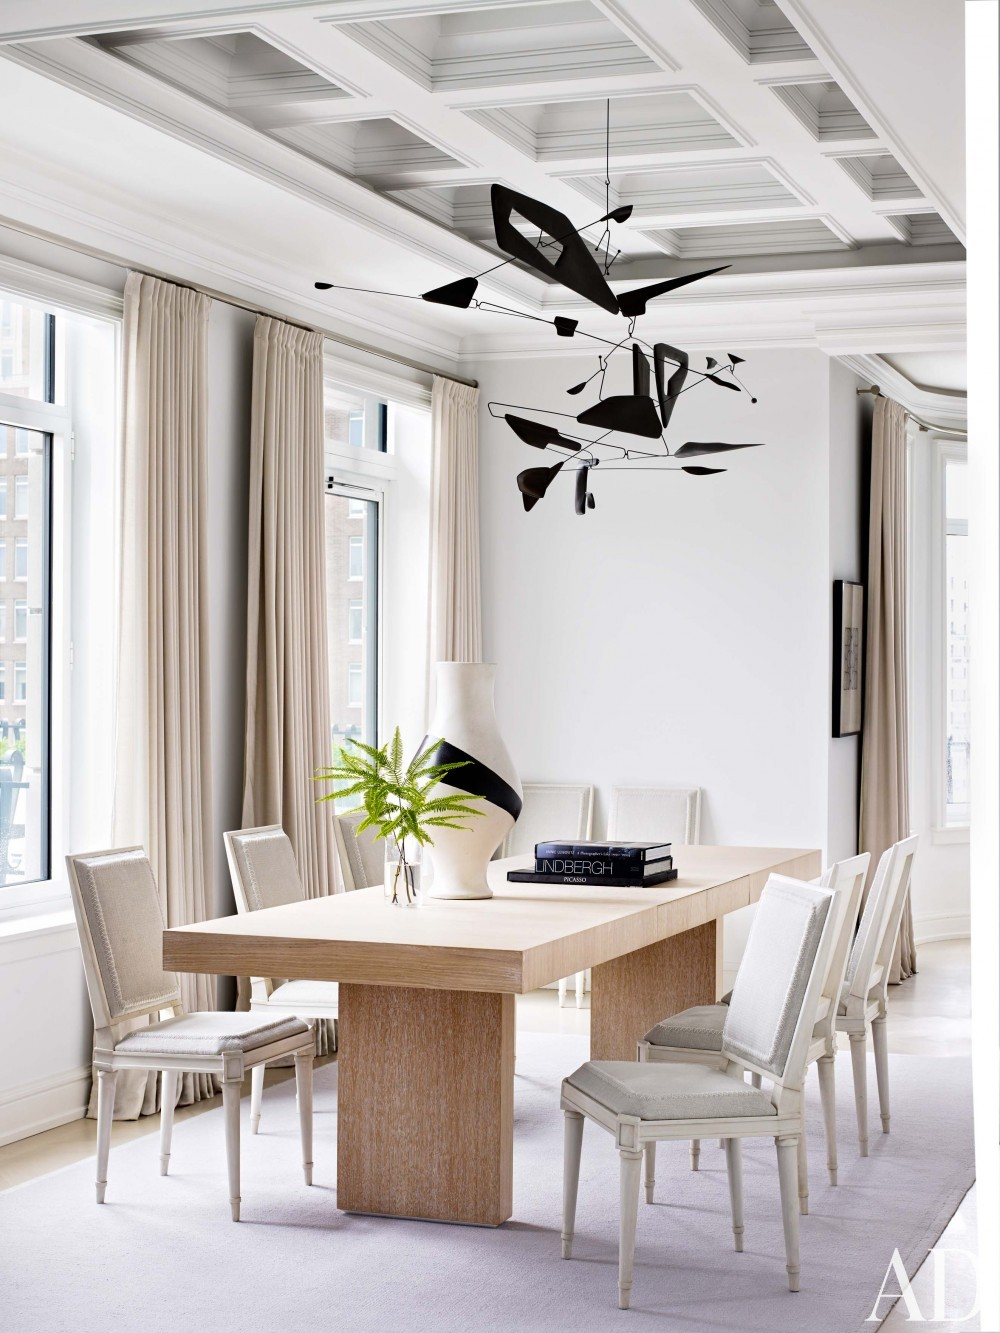 Modern Dining Room and Shelton, Mindel & Associates in New York, NY